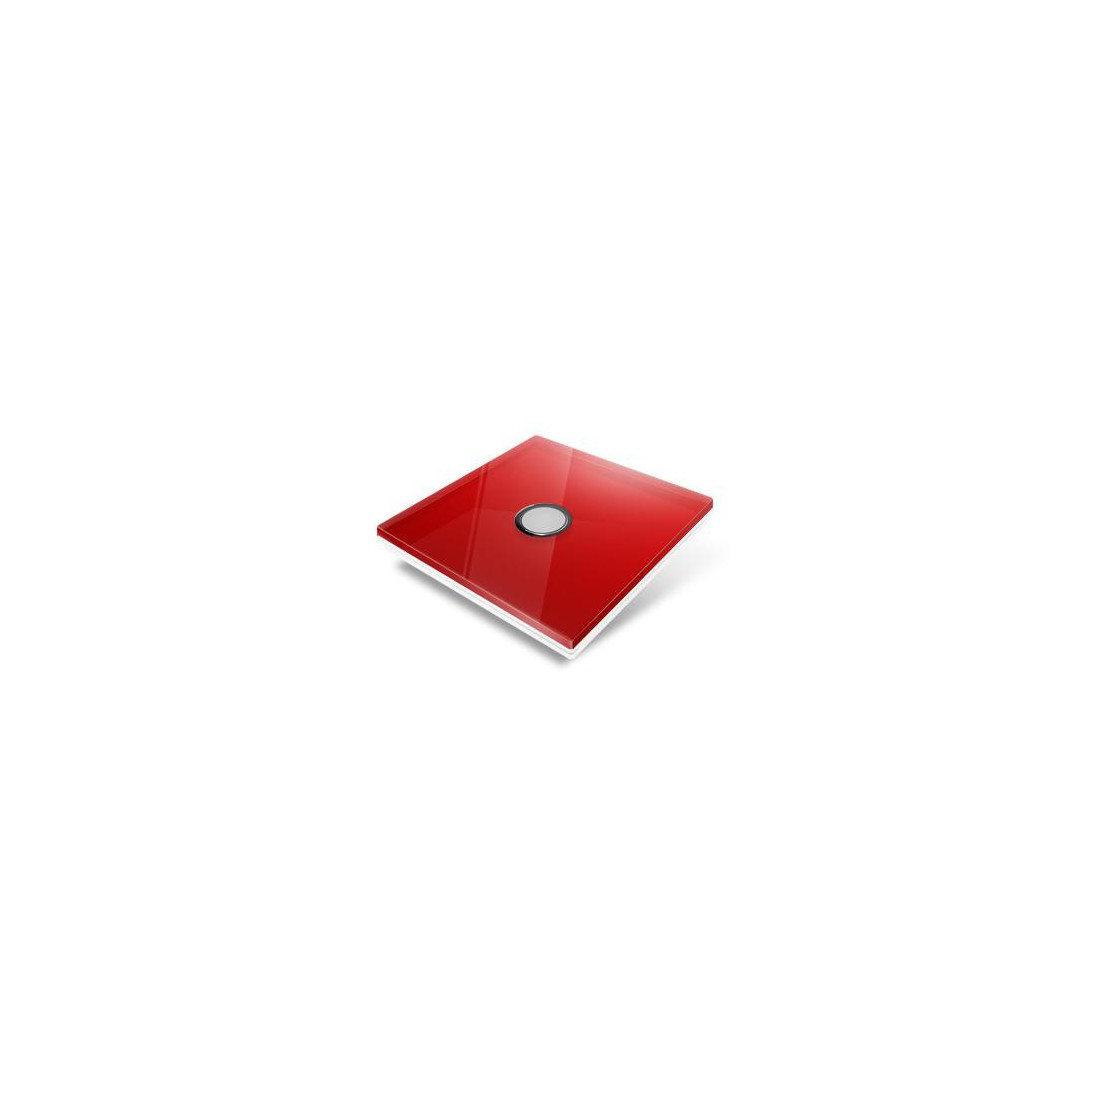 Tampa de cobertura para interruptor Edisio - cristal vermelho